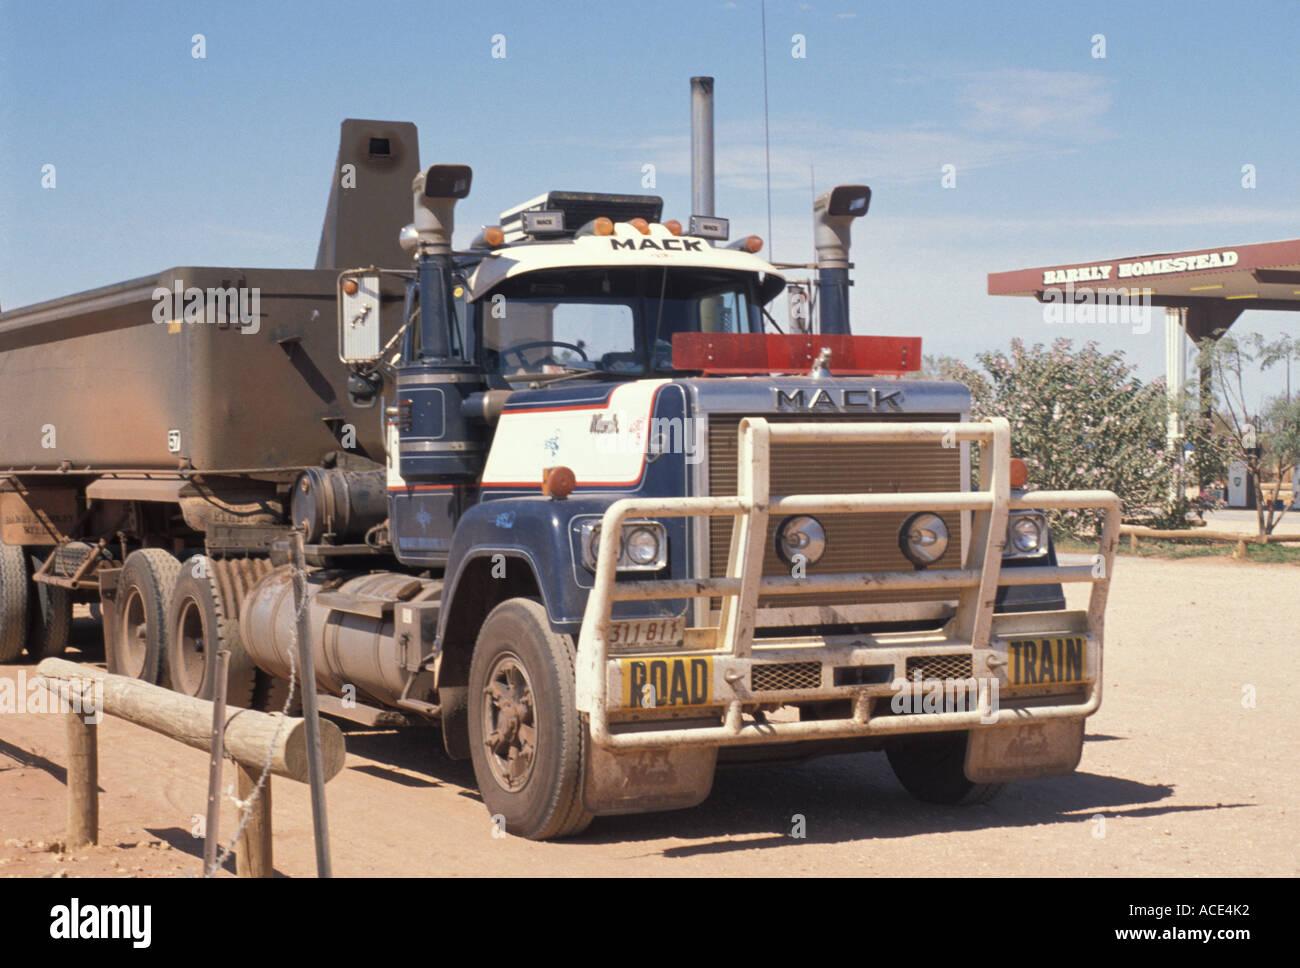 big mack outback stock photo 7502129 alamy Dump Truck Show big mack outback